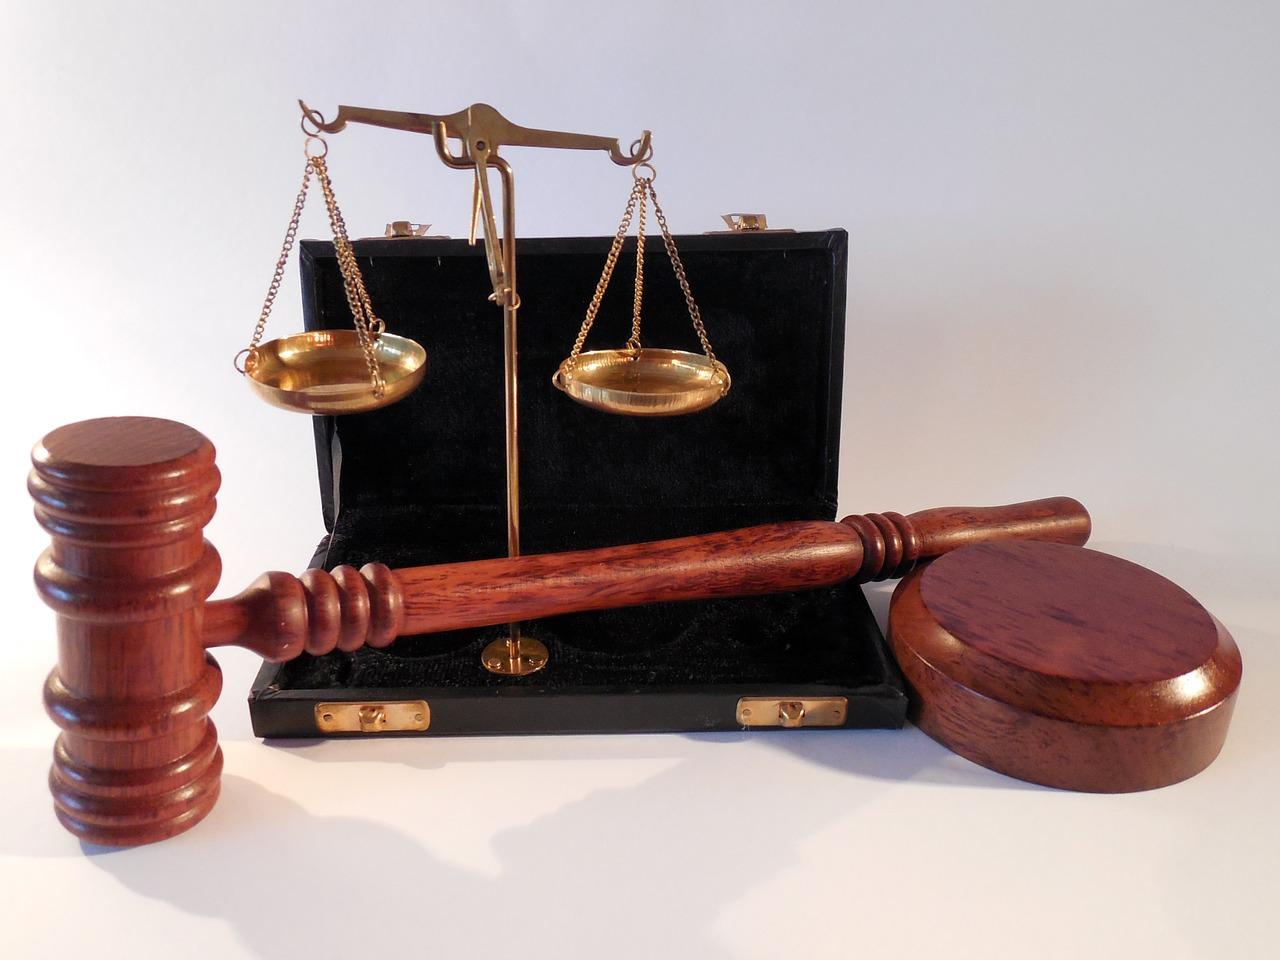 Bitfinex听证会结束:案件延期90天,双方激辩管辖权